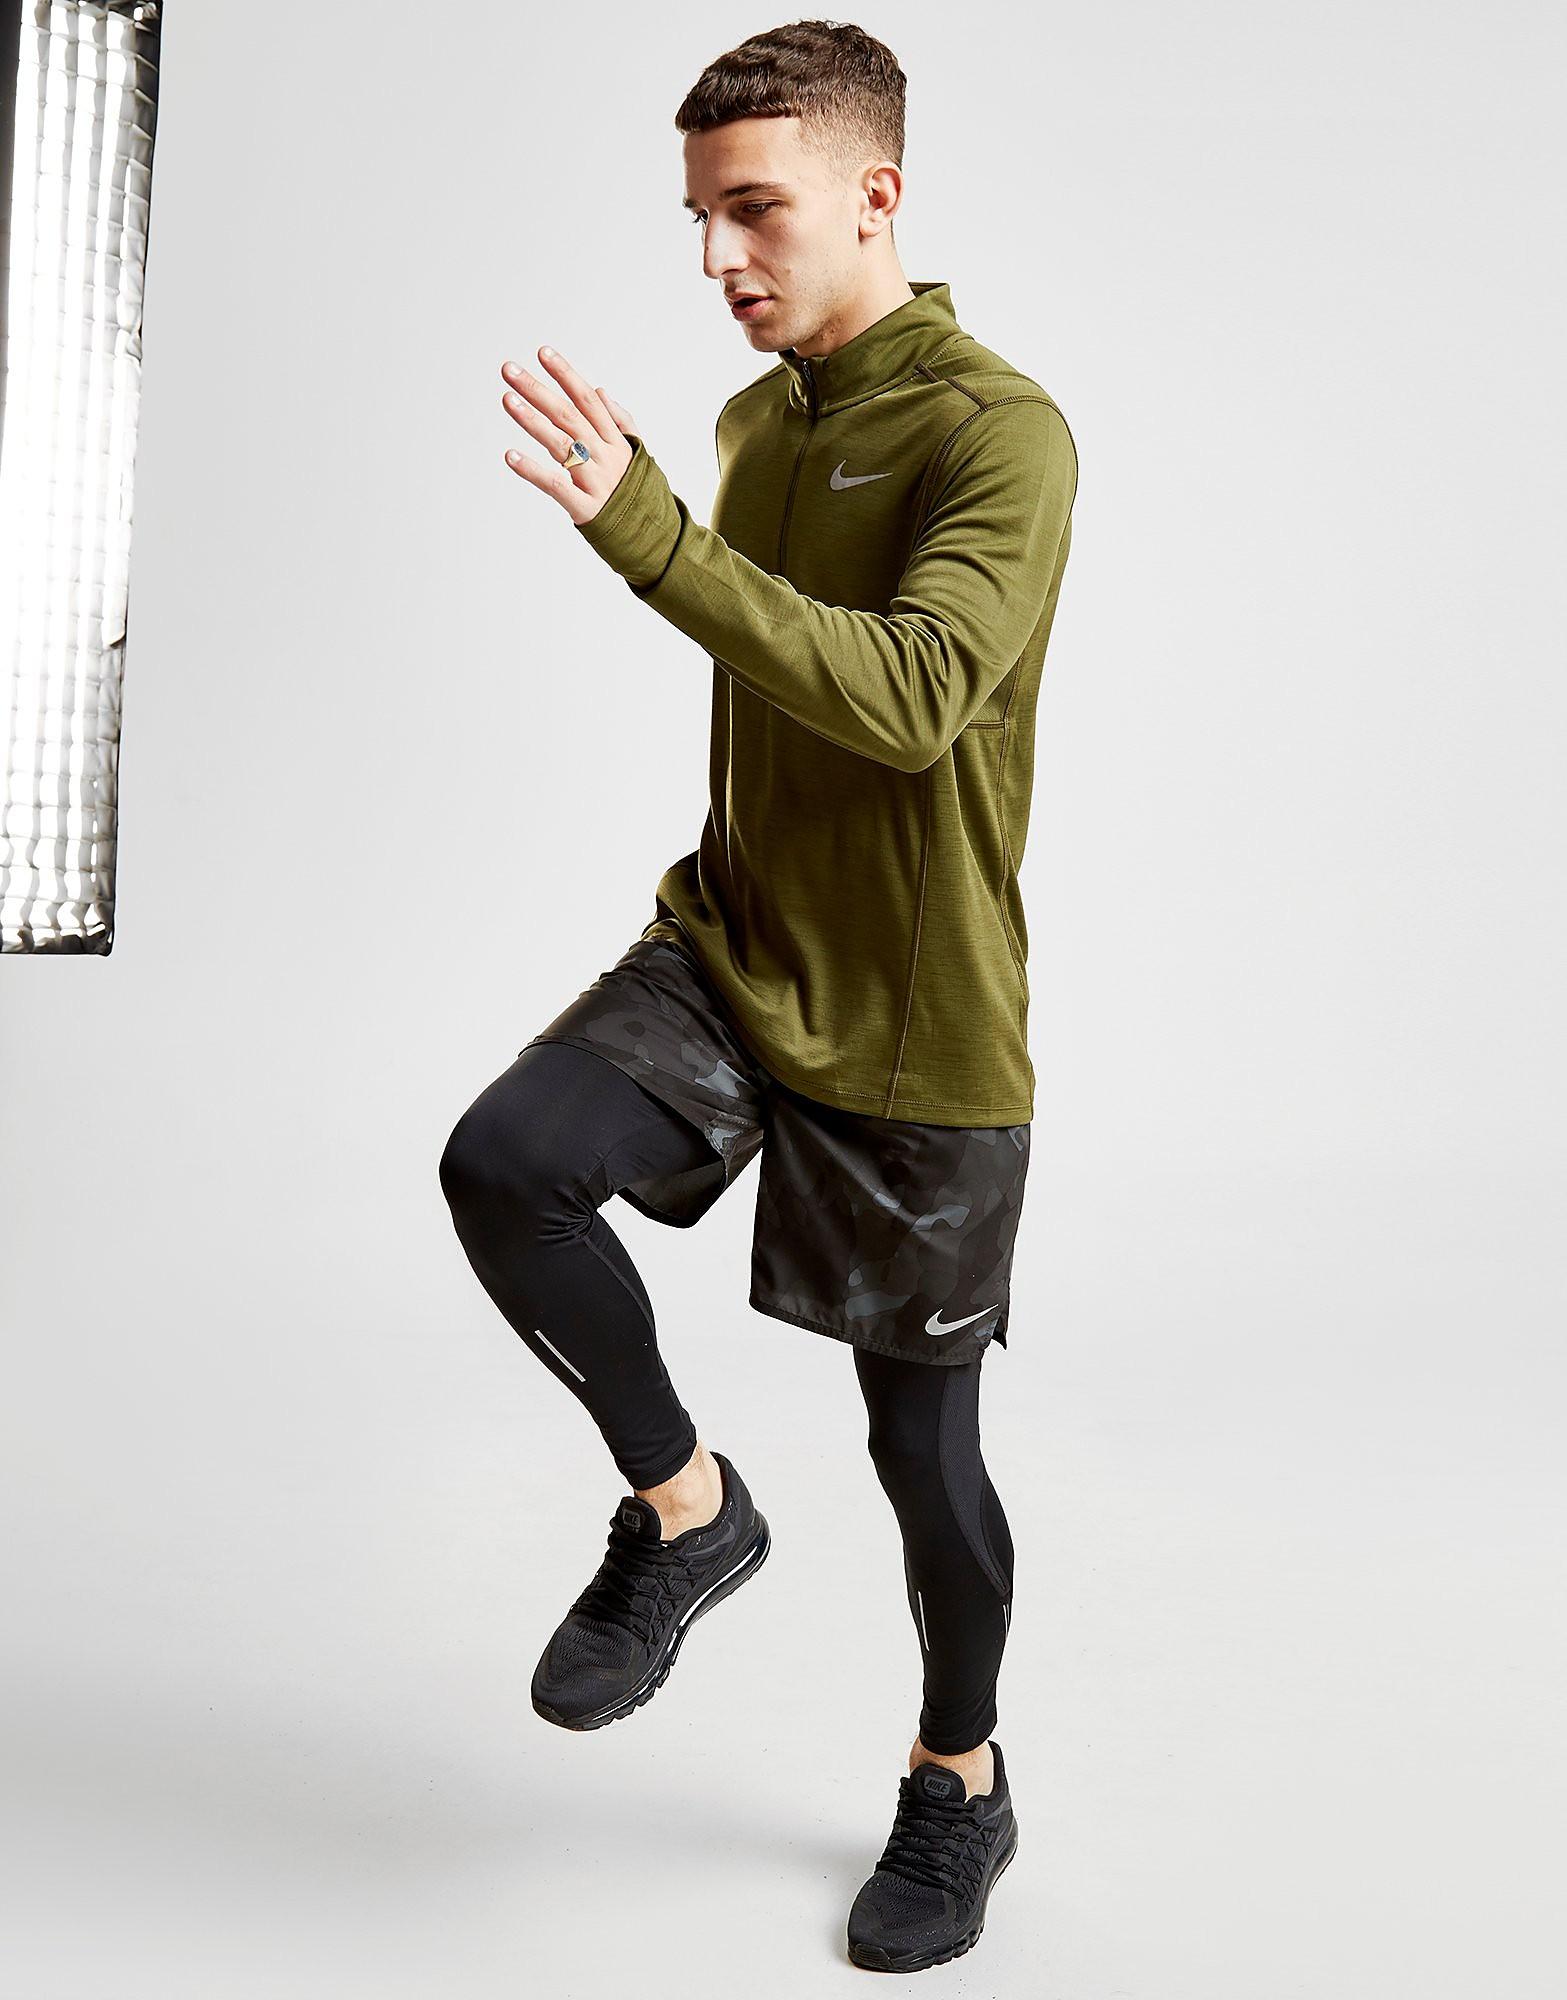 Nike Power Running Tights